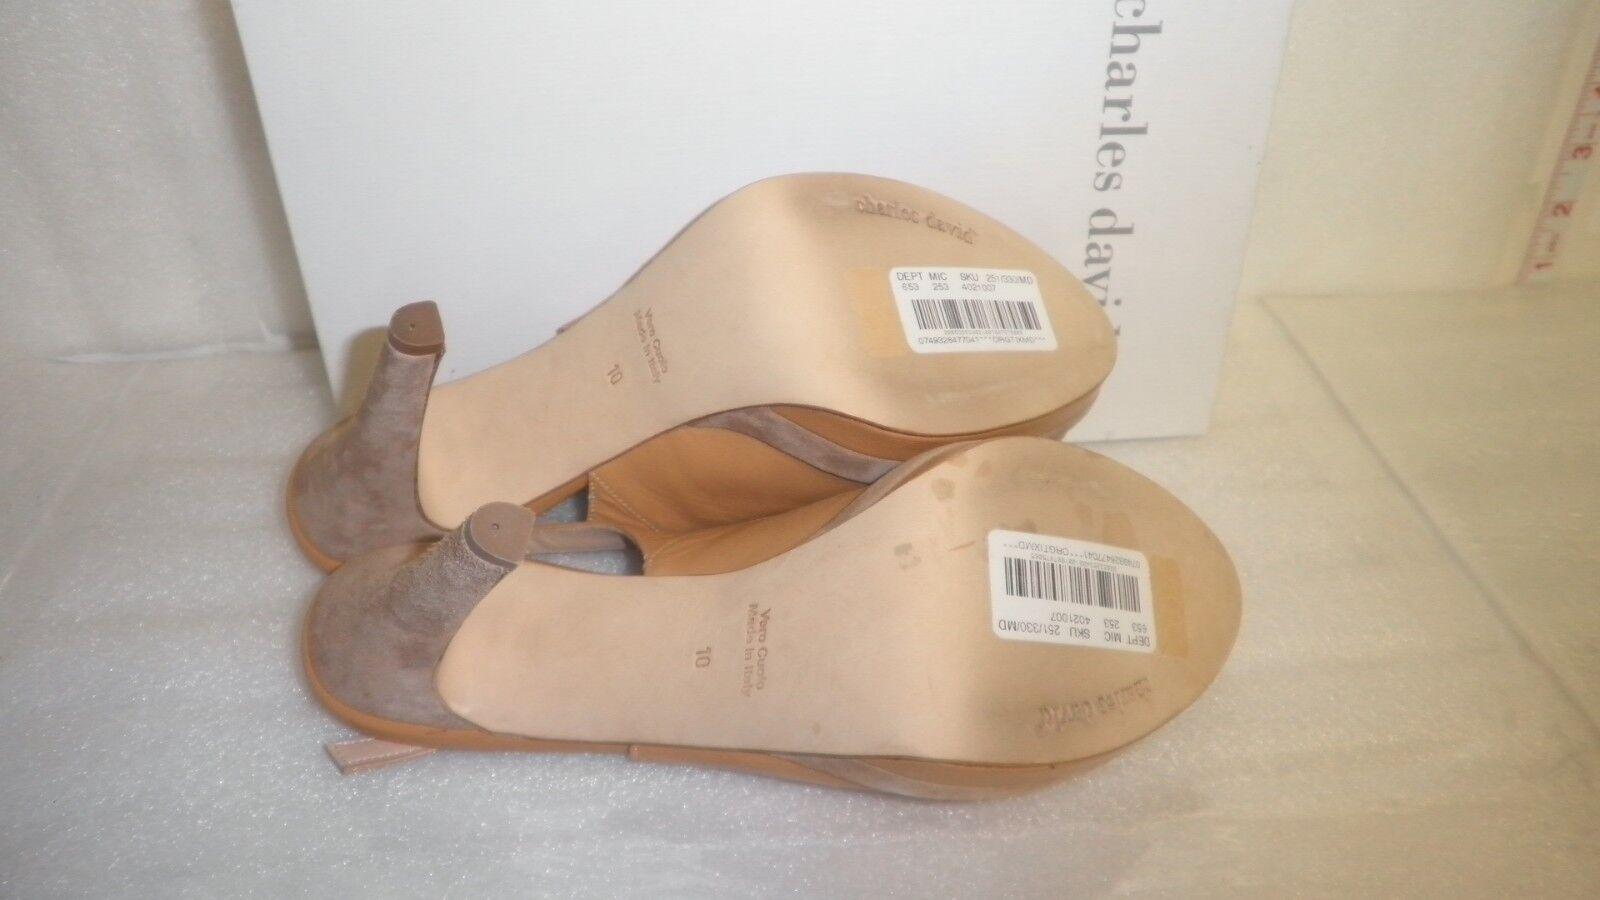 Charles David New damen braun Open Open Open Toe Slingback Heels 10 M schuhe NWB 3fe7a5